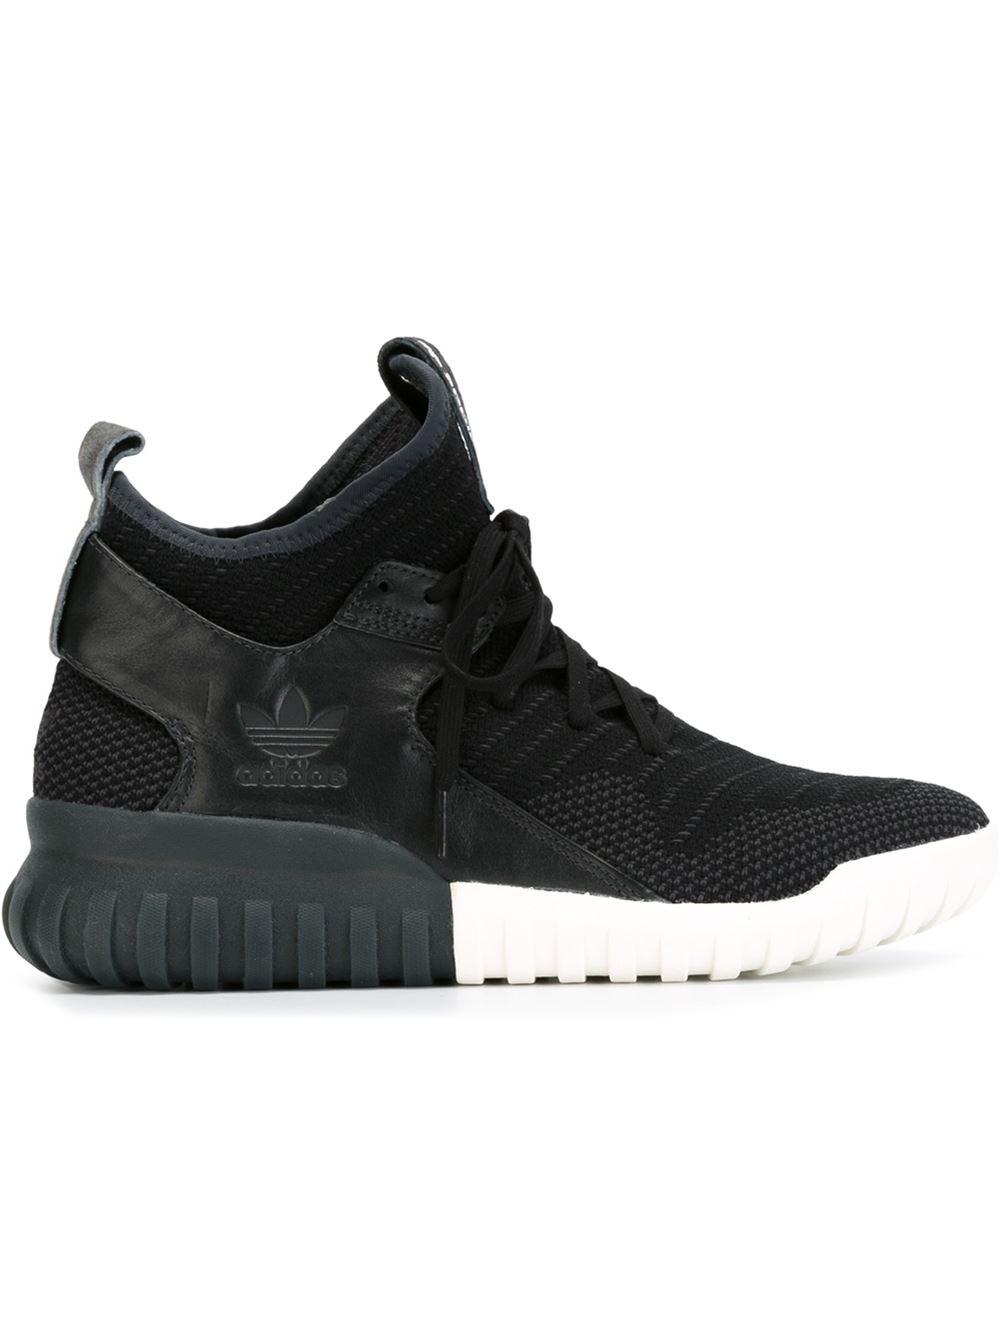 differently 03494 e9923 adidas-black-tubular -primeknit-hi-top-sneakers-product-1-023697973-normal.jpeg